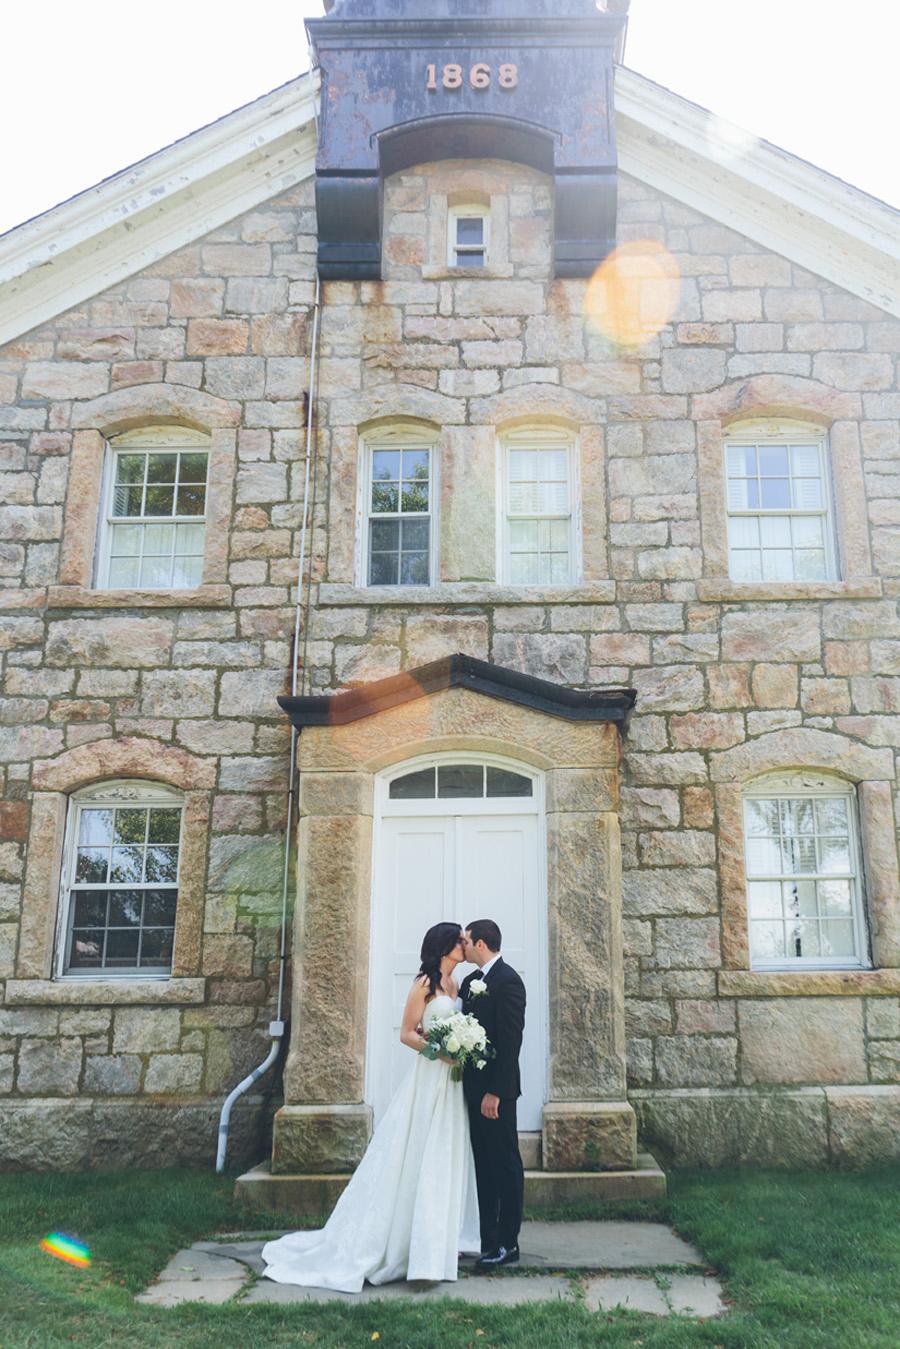 VICTORIA-BRIAN-NY-WEDDING-FIRSTLK-CYNTHIACHUNG-0070.jpg